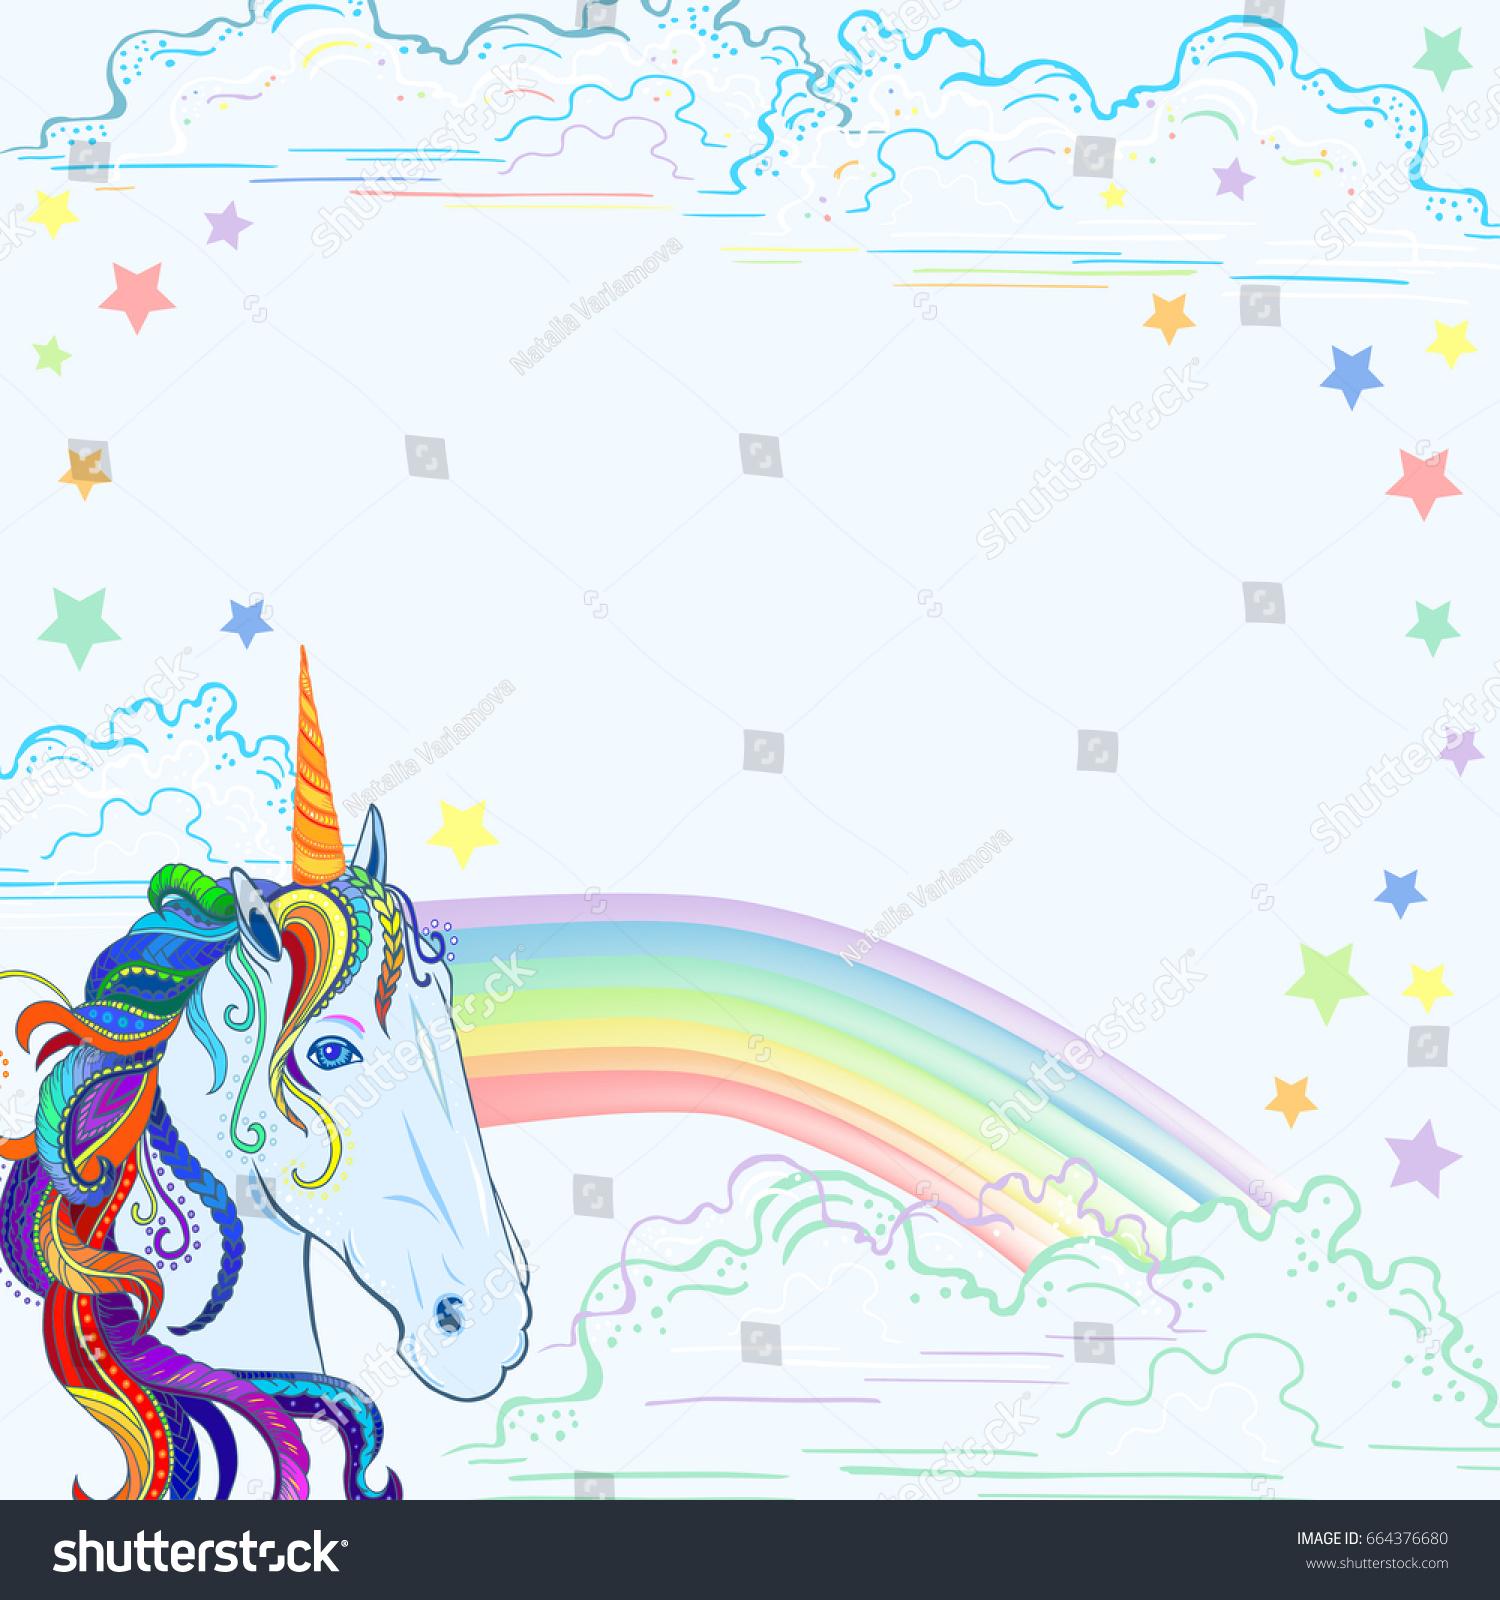 Template Unicorn Rainbow Clouds Stars Text Stock Vector (Royalty ...